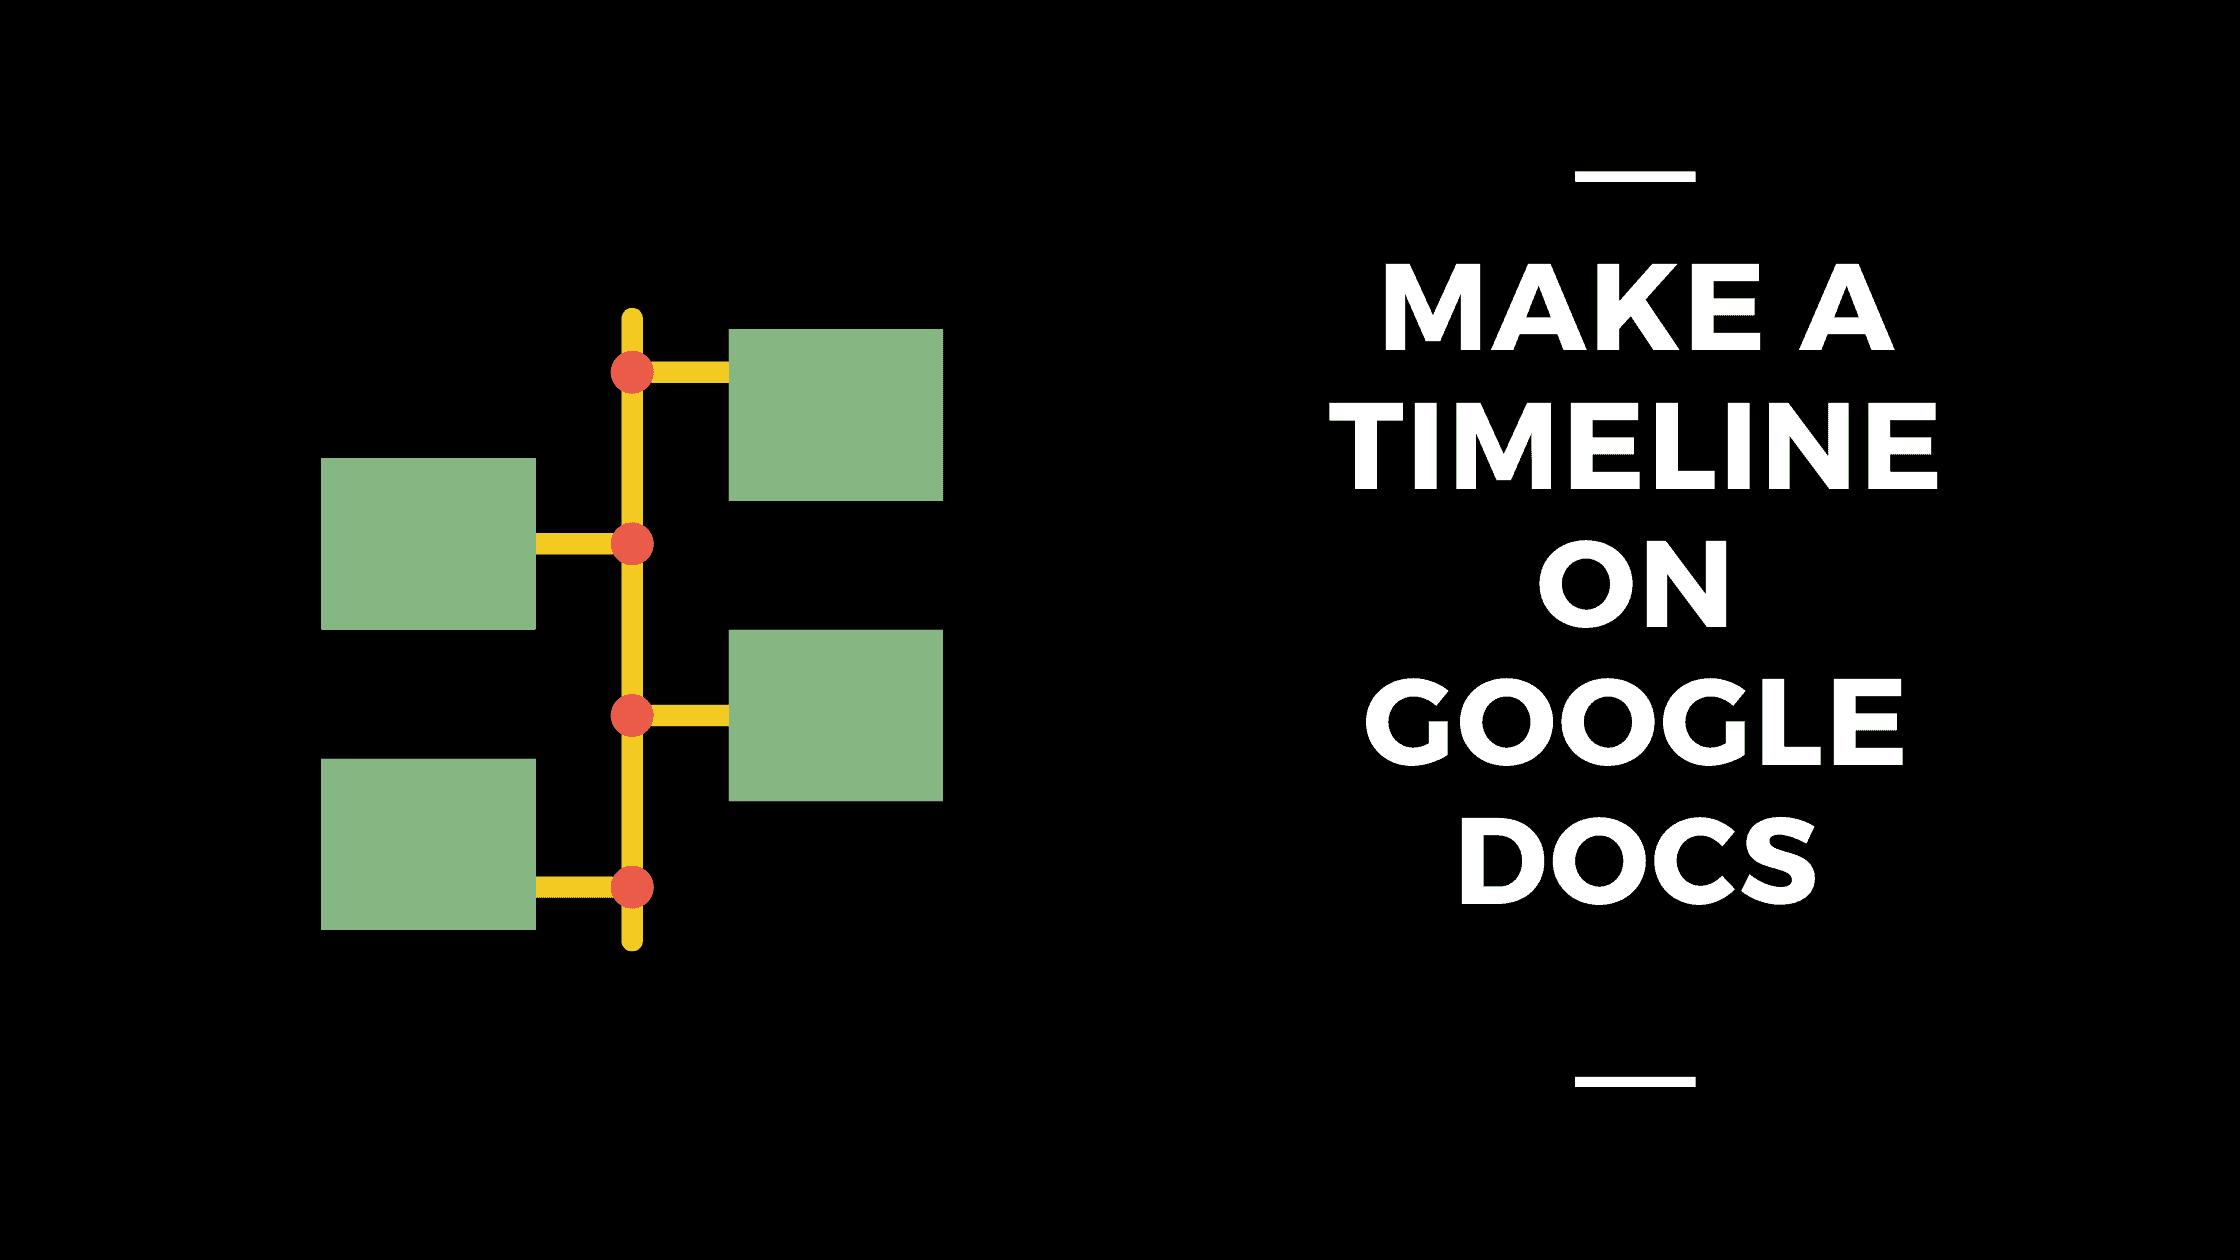 how to make a timeline on Google Docs